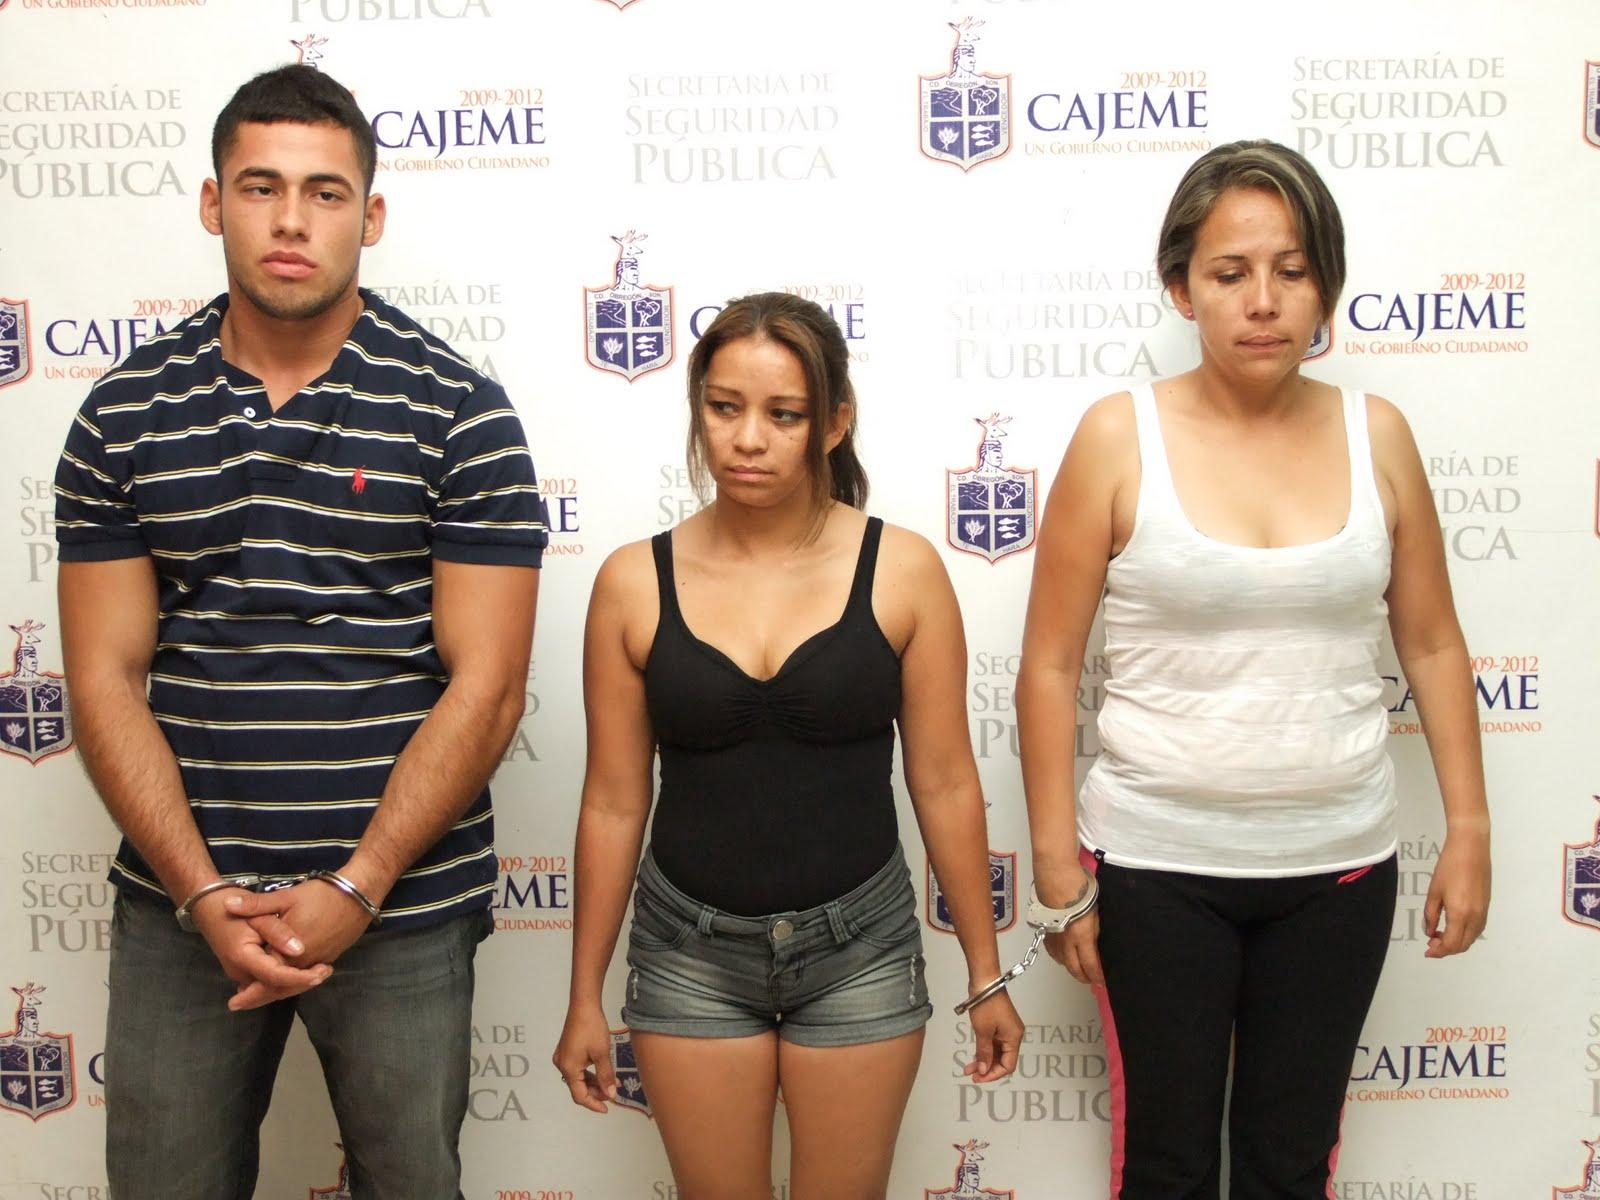 http://3.bp.blogspot.com/_F38EtU9iaTw/S_bRO1RHURI/AAAAAAAANYQ/J9x5bviHvIk/s1600/JOSE_ALFREDO_HERNANDEZ_TOSCANO_ANDREA_PERDOMO_PENAGOS_Y_SANDRA_YADIRA_CAMPOS_LAVERDE.jpg